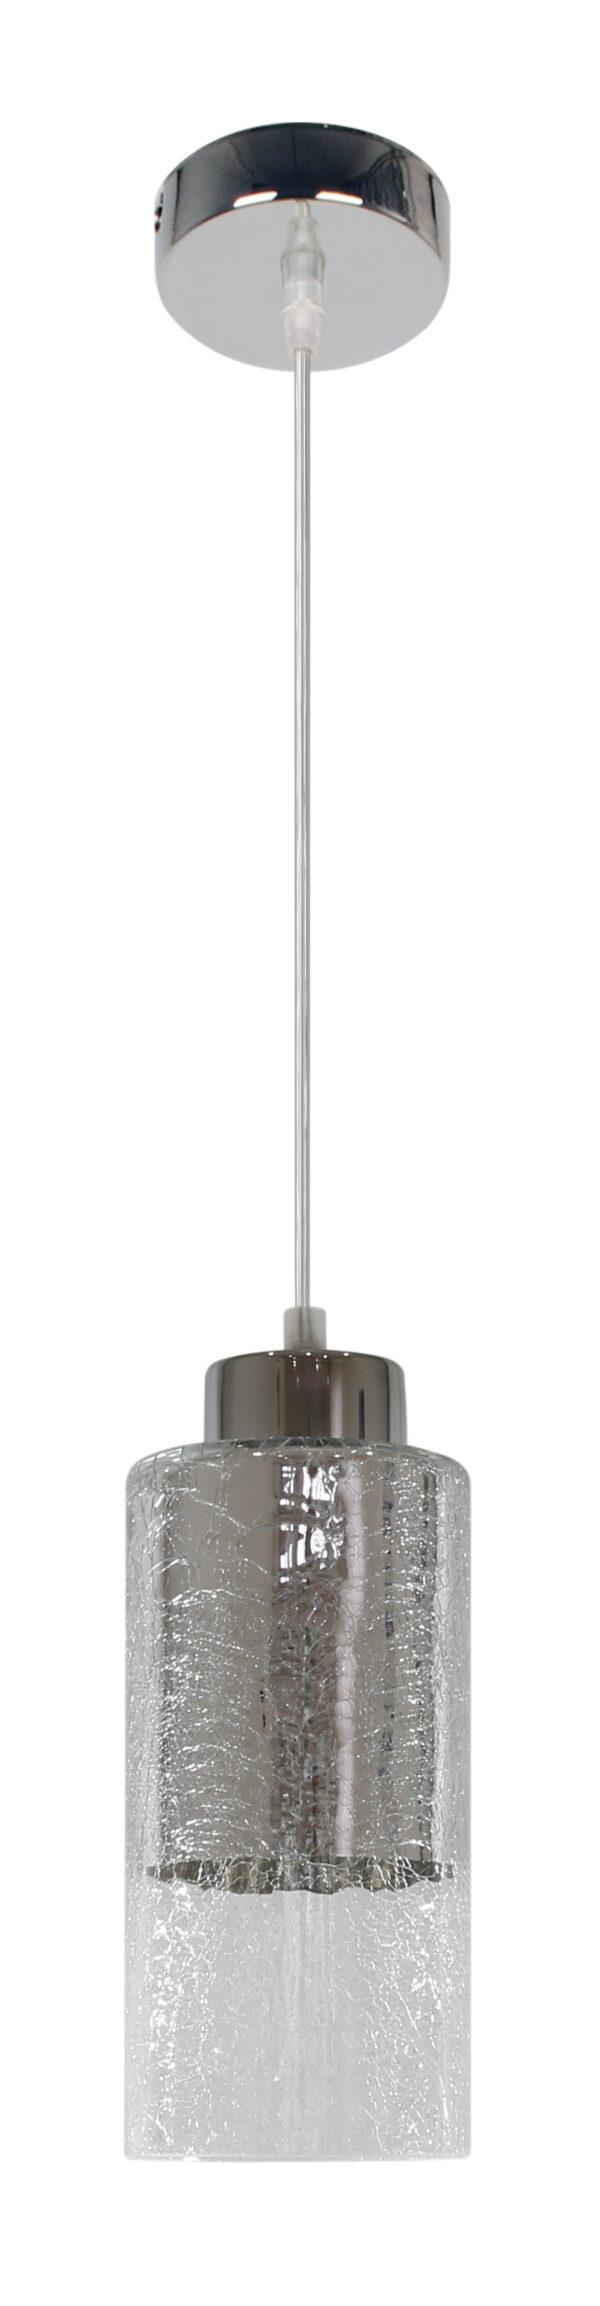 LIBANO LAMPA WISZĄCA 10 1X60W E27 SREBRNY - 31-51646